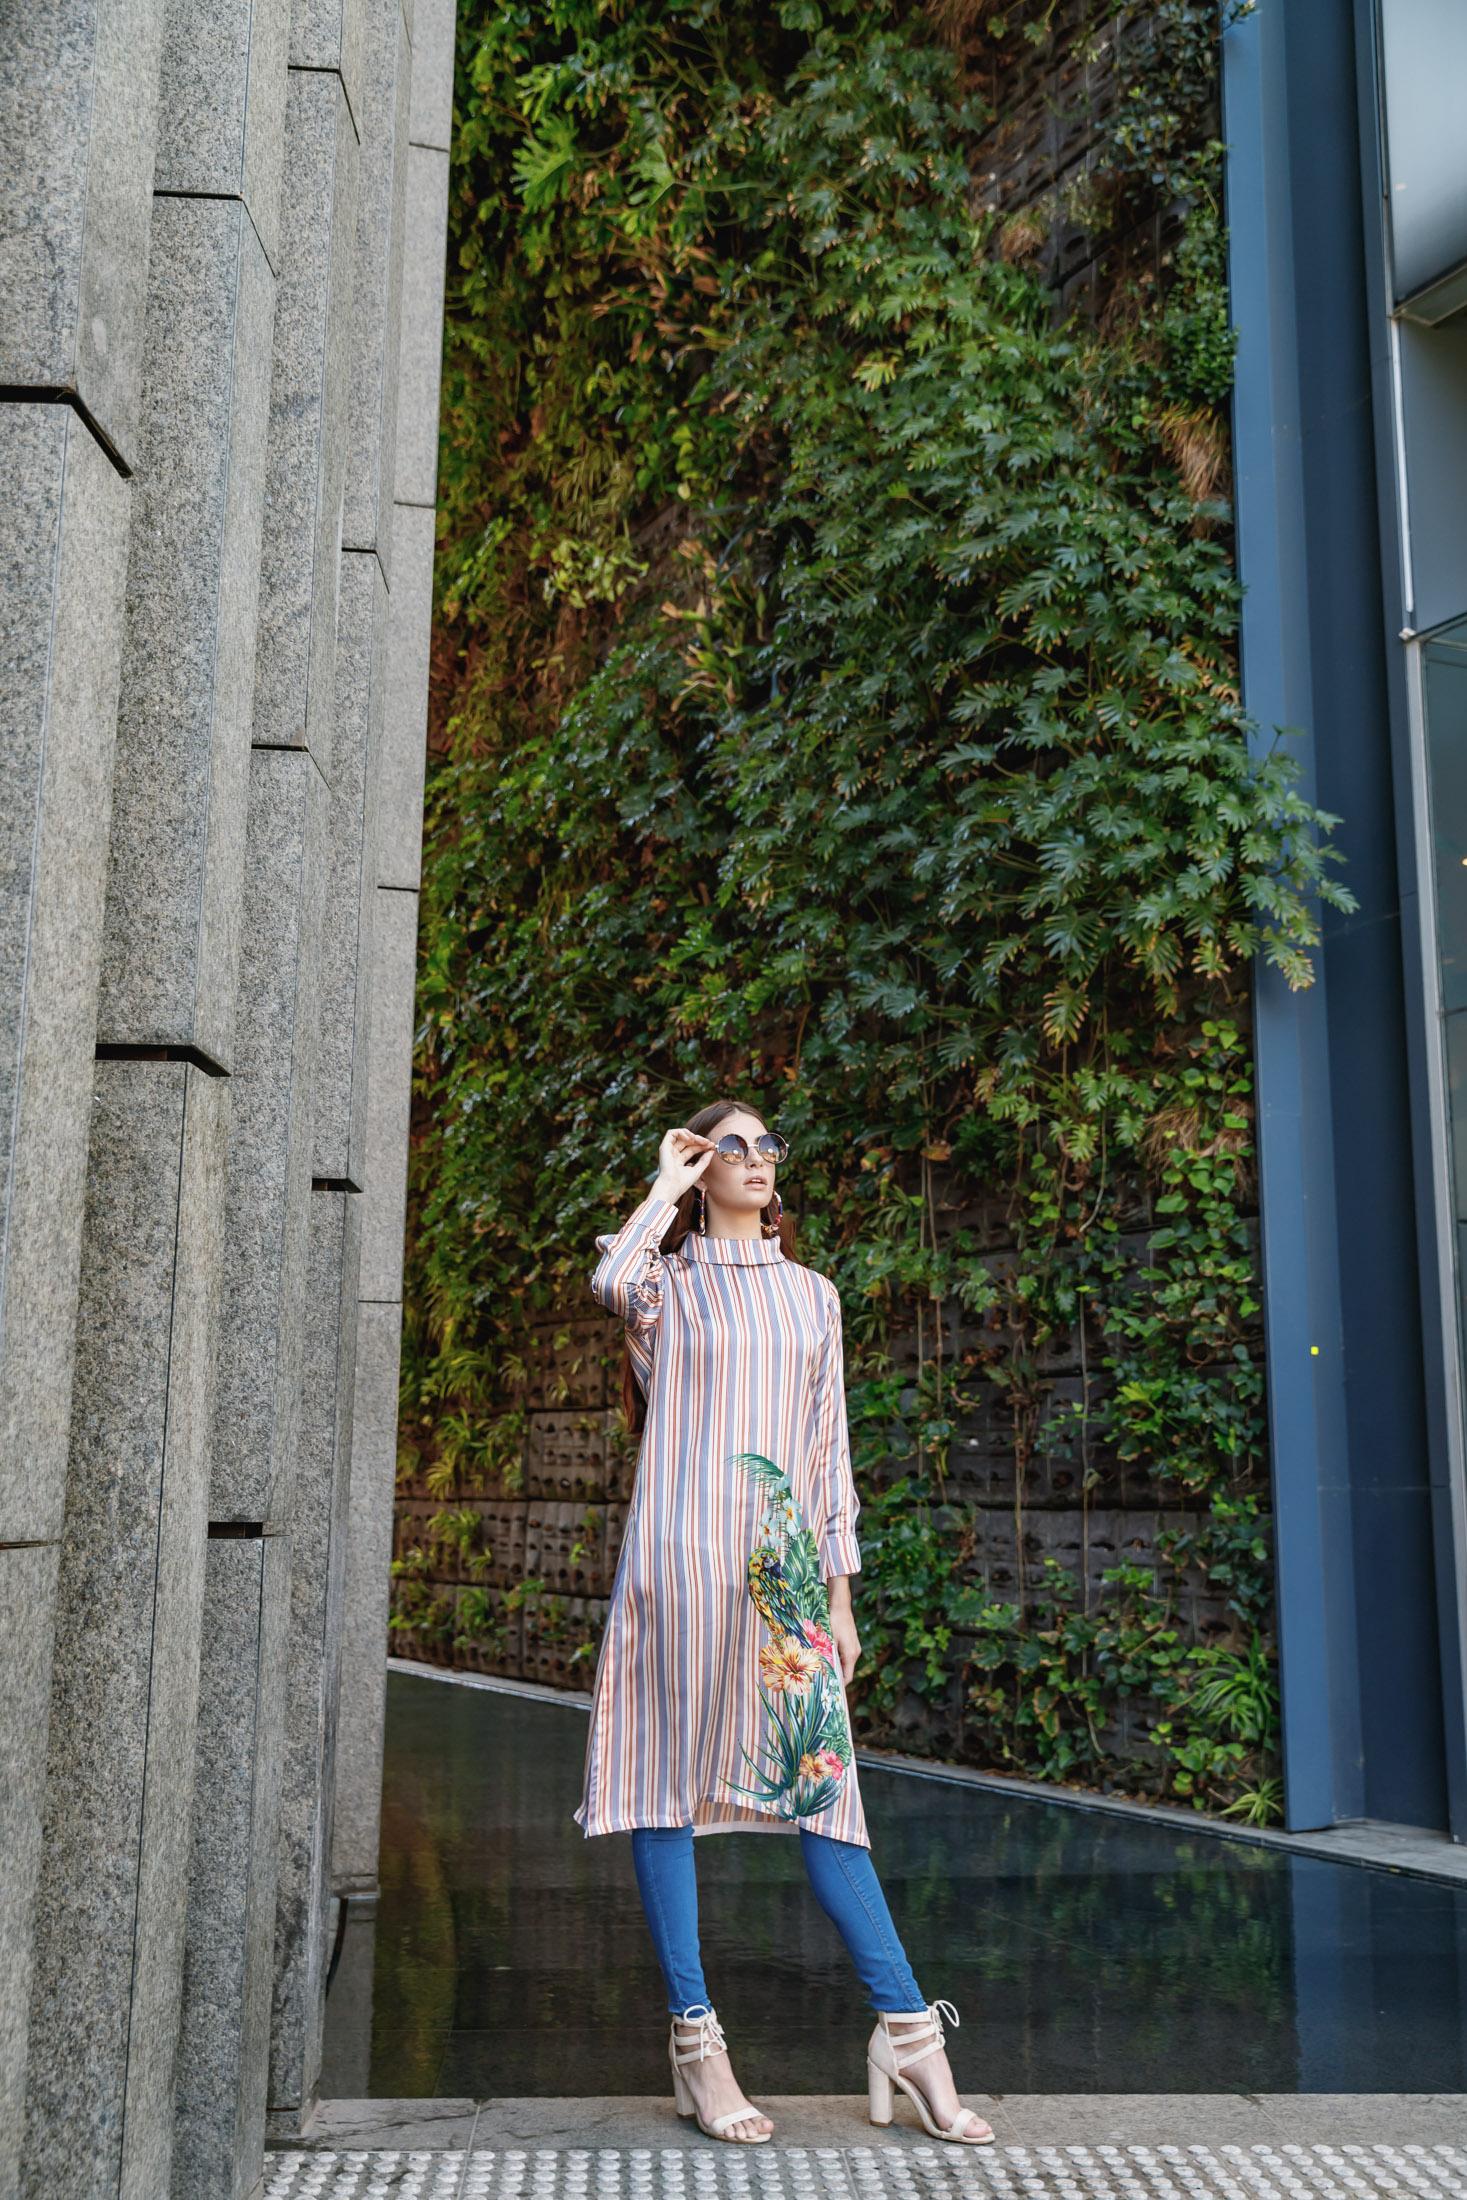 Ammon_Creative-Fashion_Photography-Vogue_Sultana_Bangladesh-Old_Treasury-Perth-002-0007.jpg